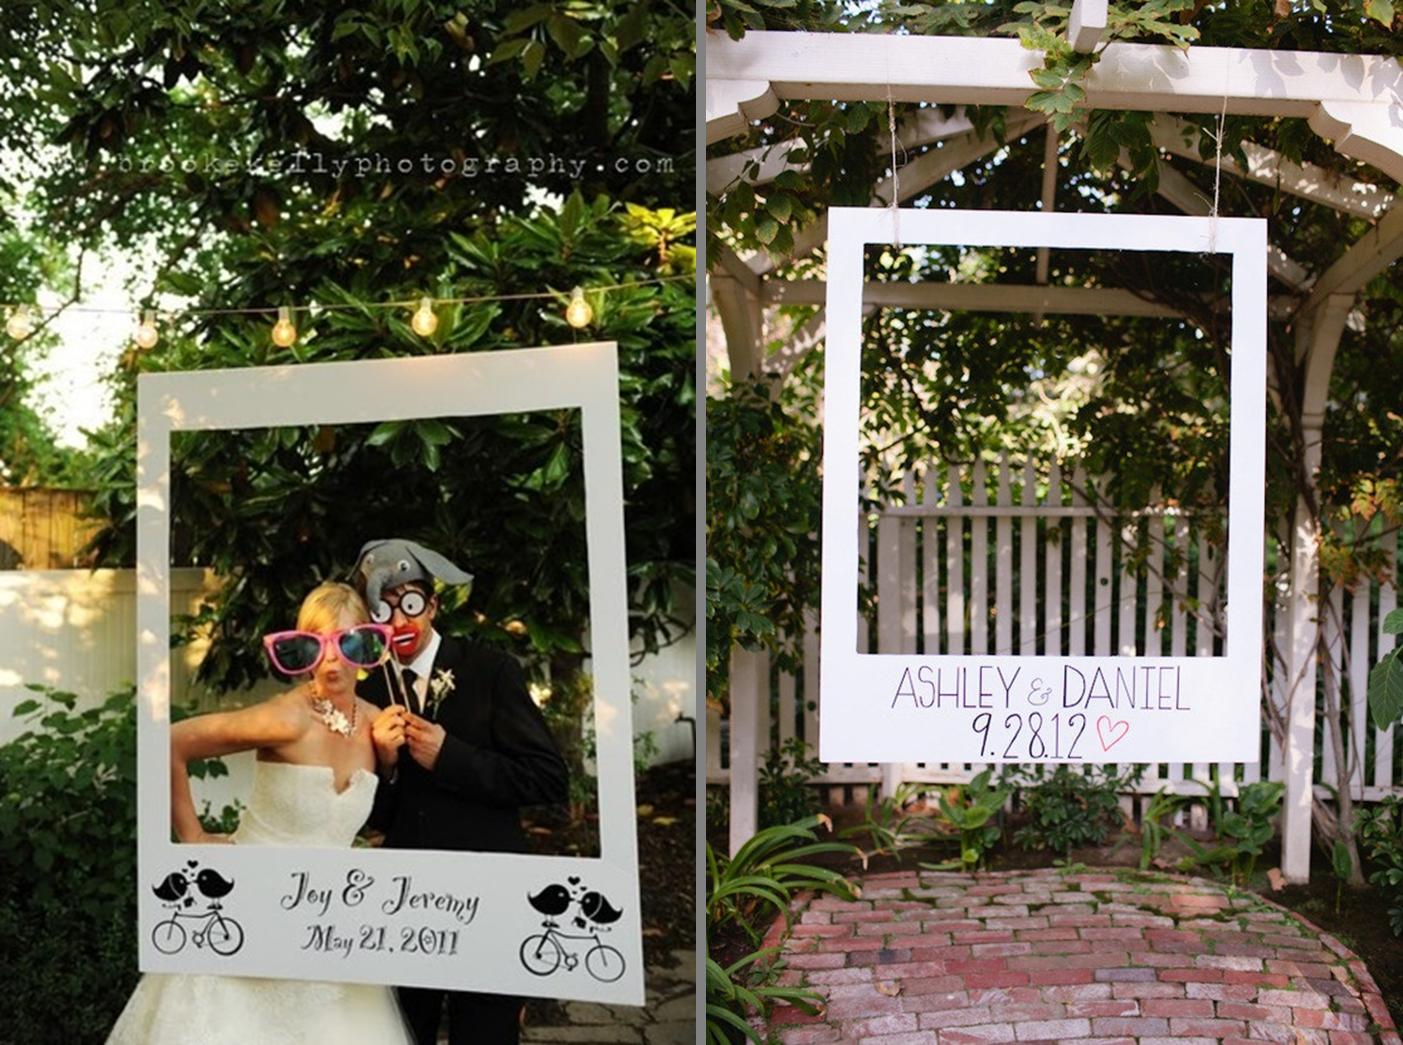 La galla handmade quiero hacer este photocall casero - Photocall boda casero ...